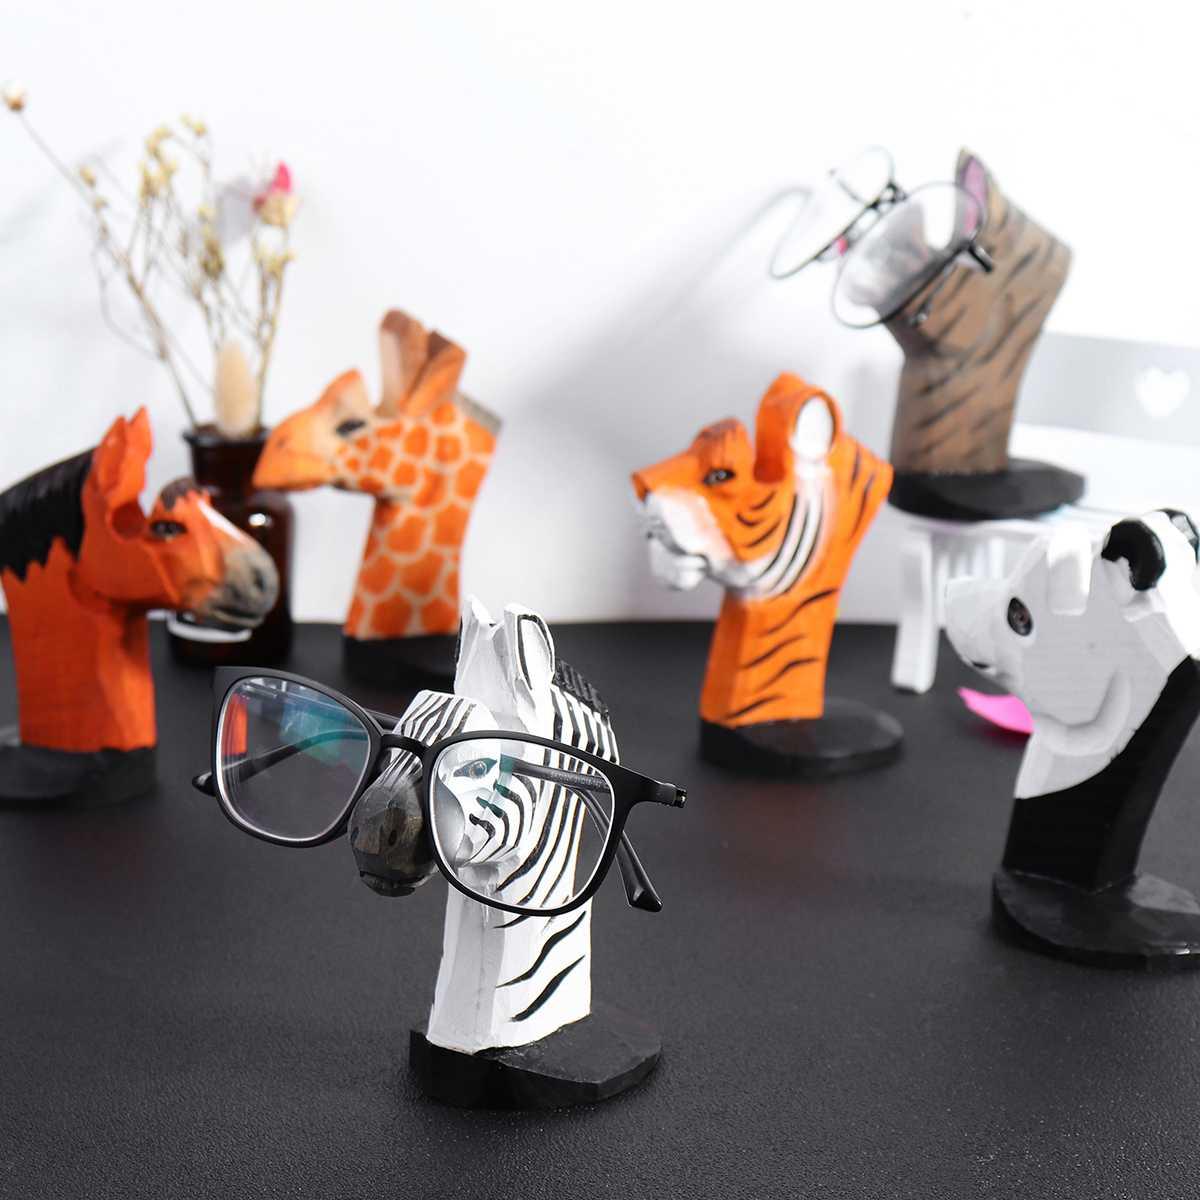 NEW 4 PAIR NATURAL WOODEN SUNGLASS DISPLAY RACK wood sunglasses holder